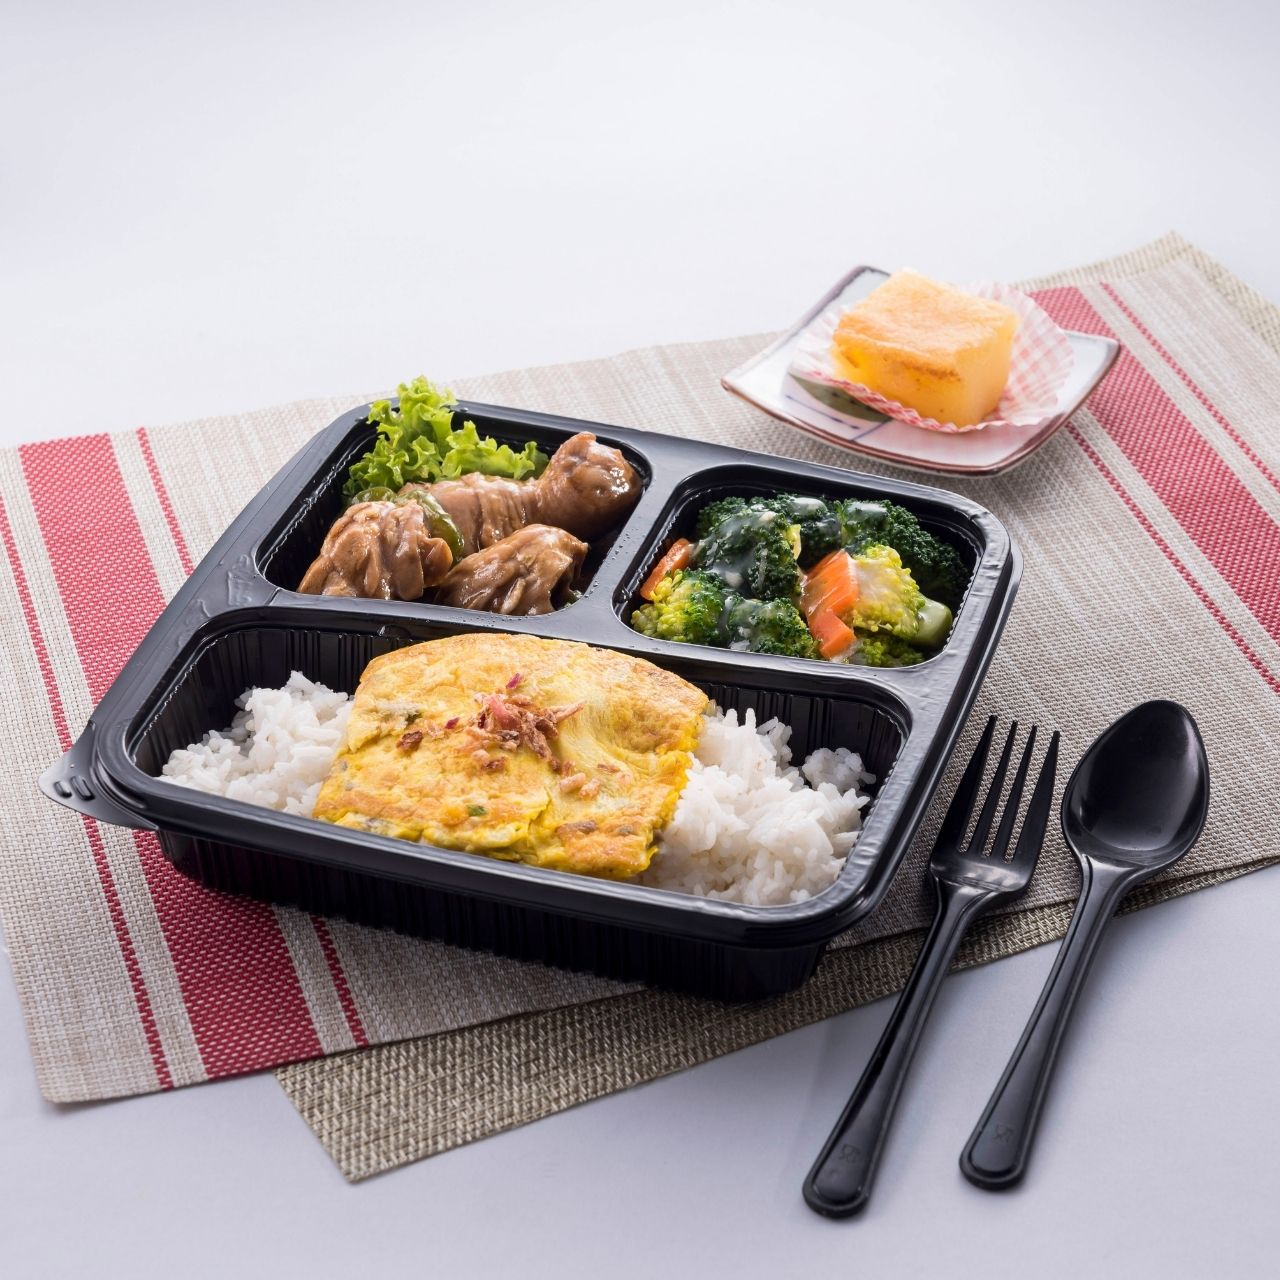 runningmen catering bento box steam rice with egg sauce bittergourd chicken